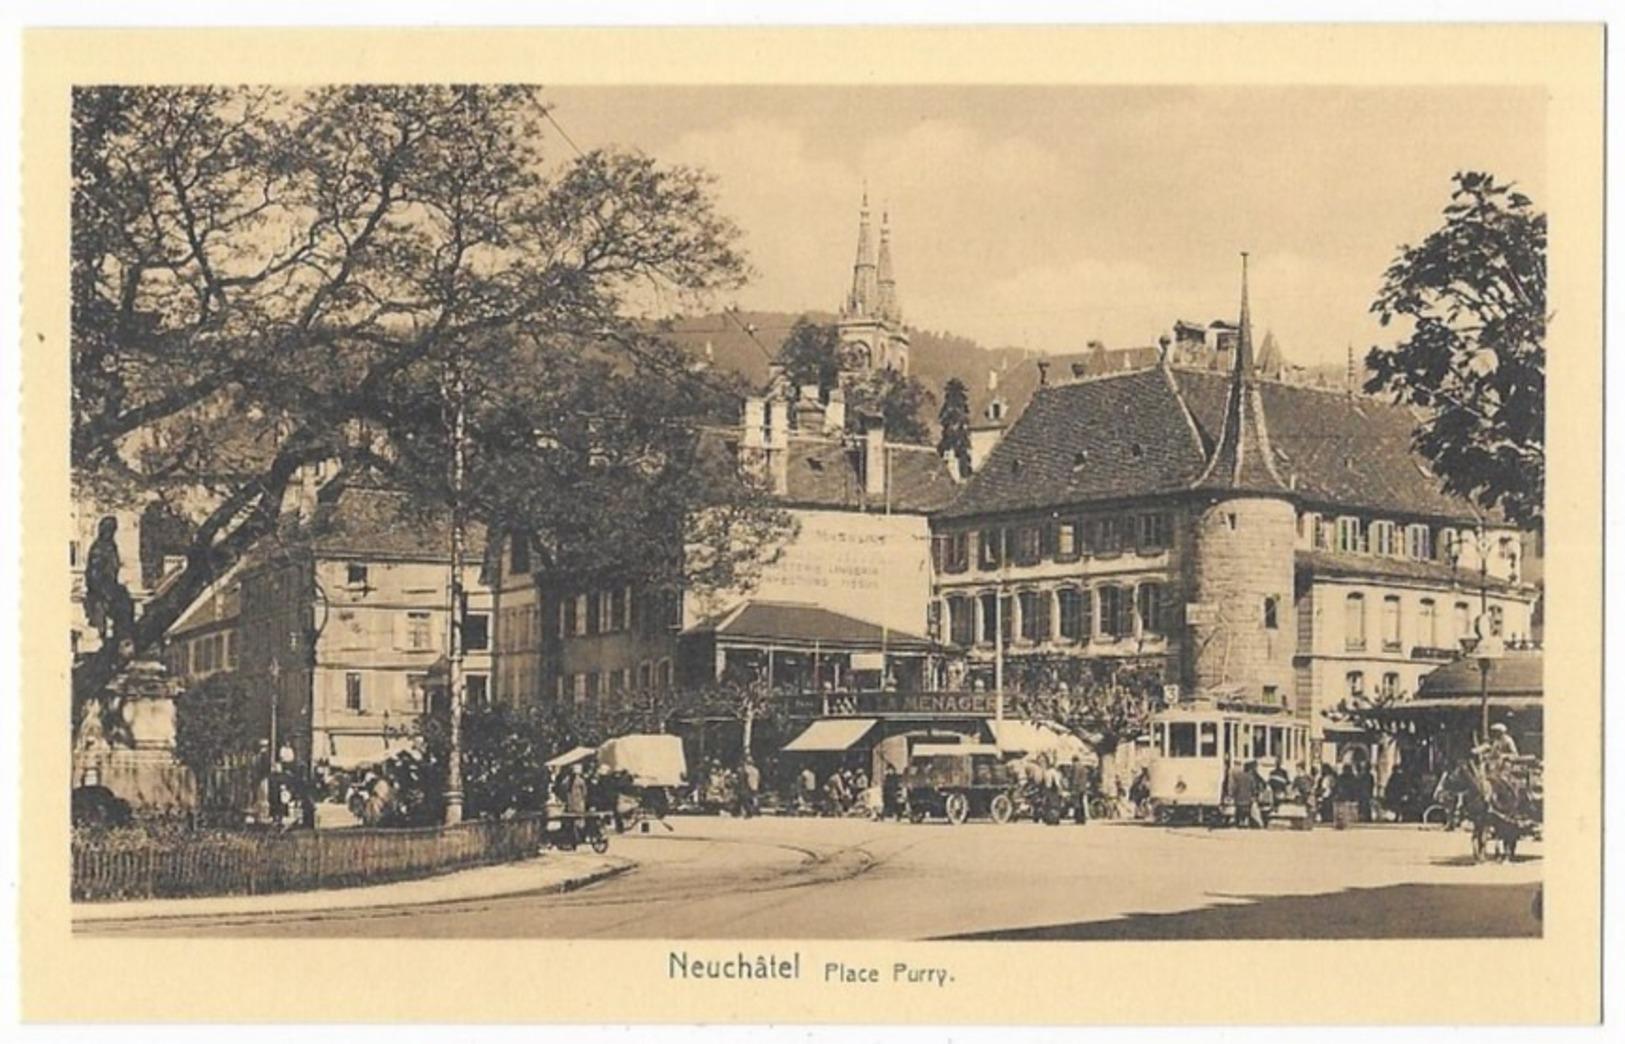 Neuchatel Tramway A La Ménagère Place Purry - NE Neuchâtel